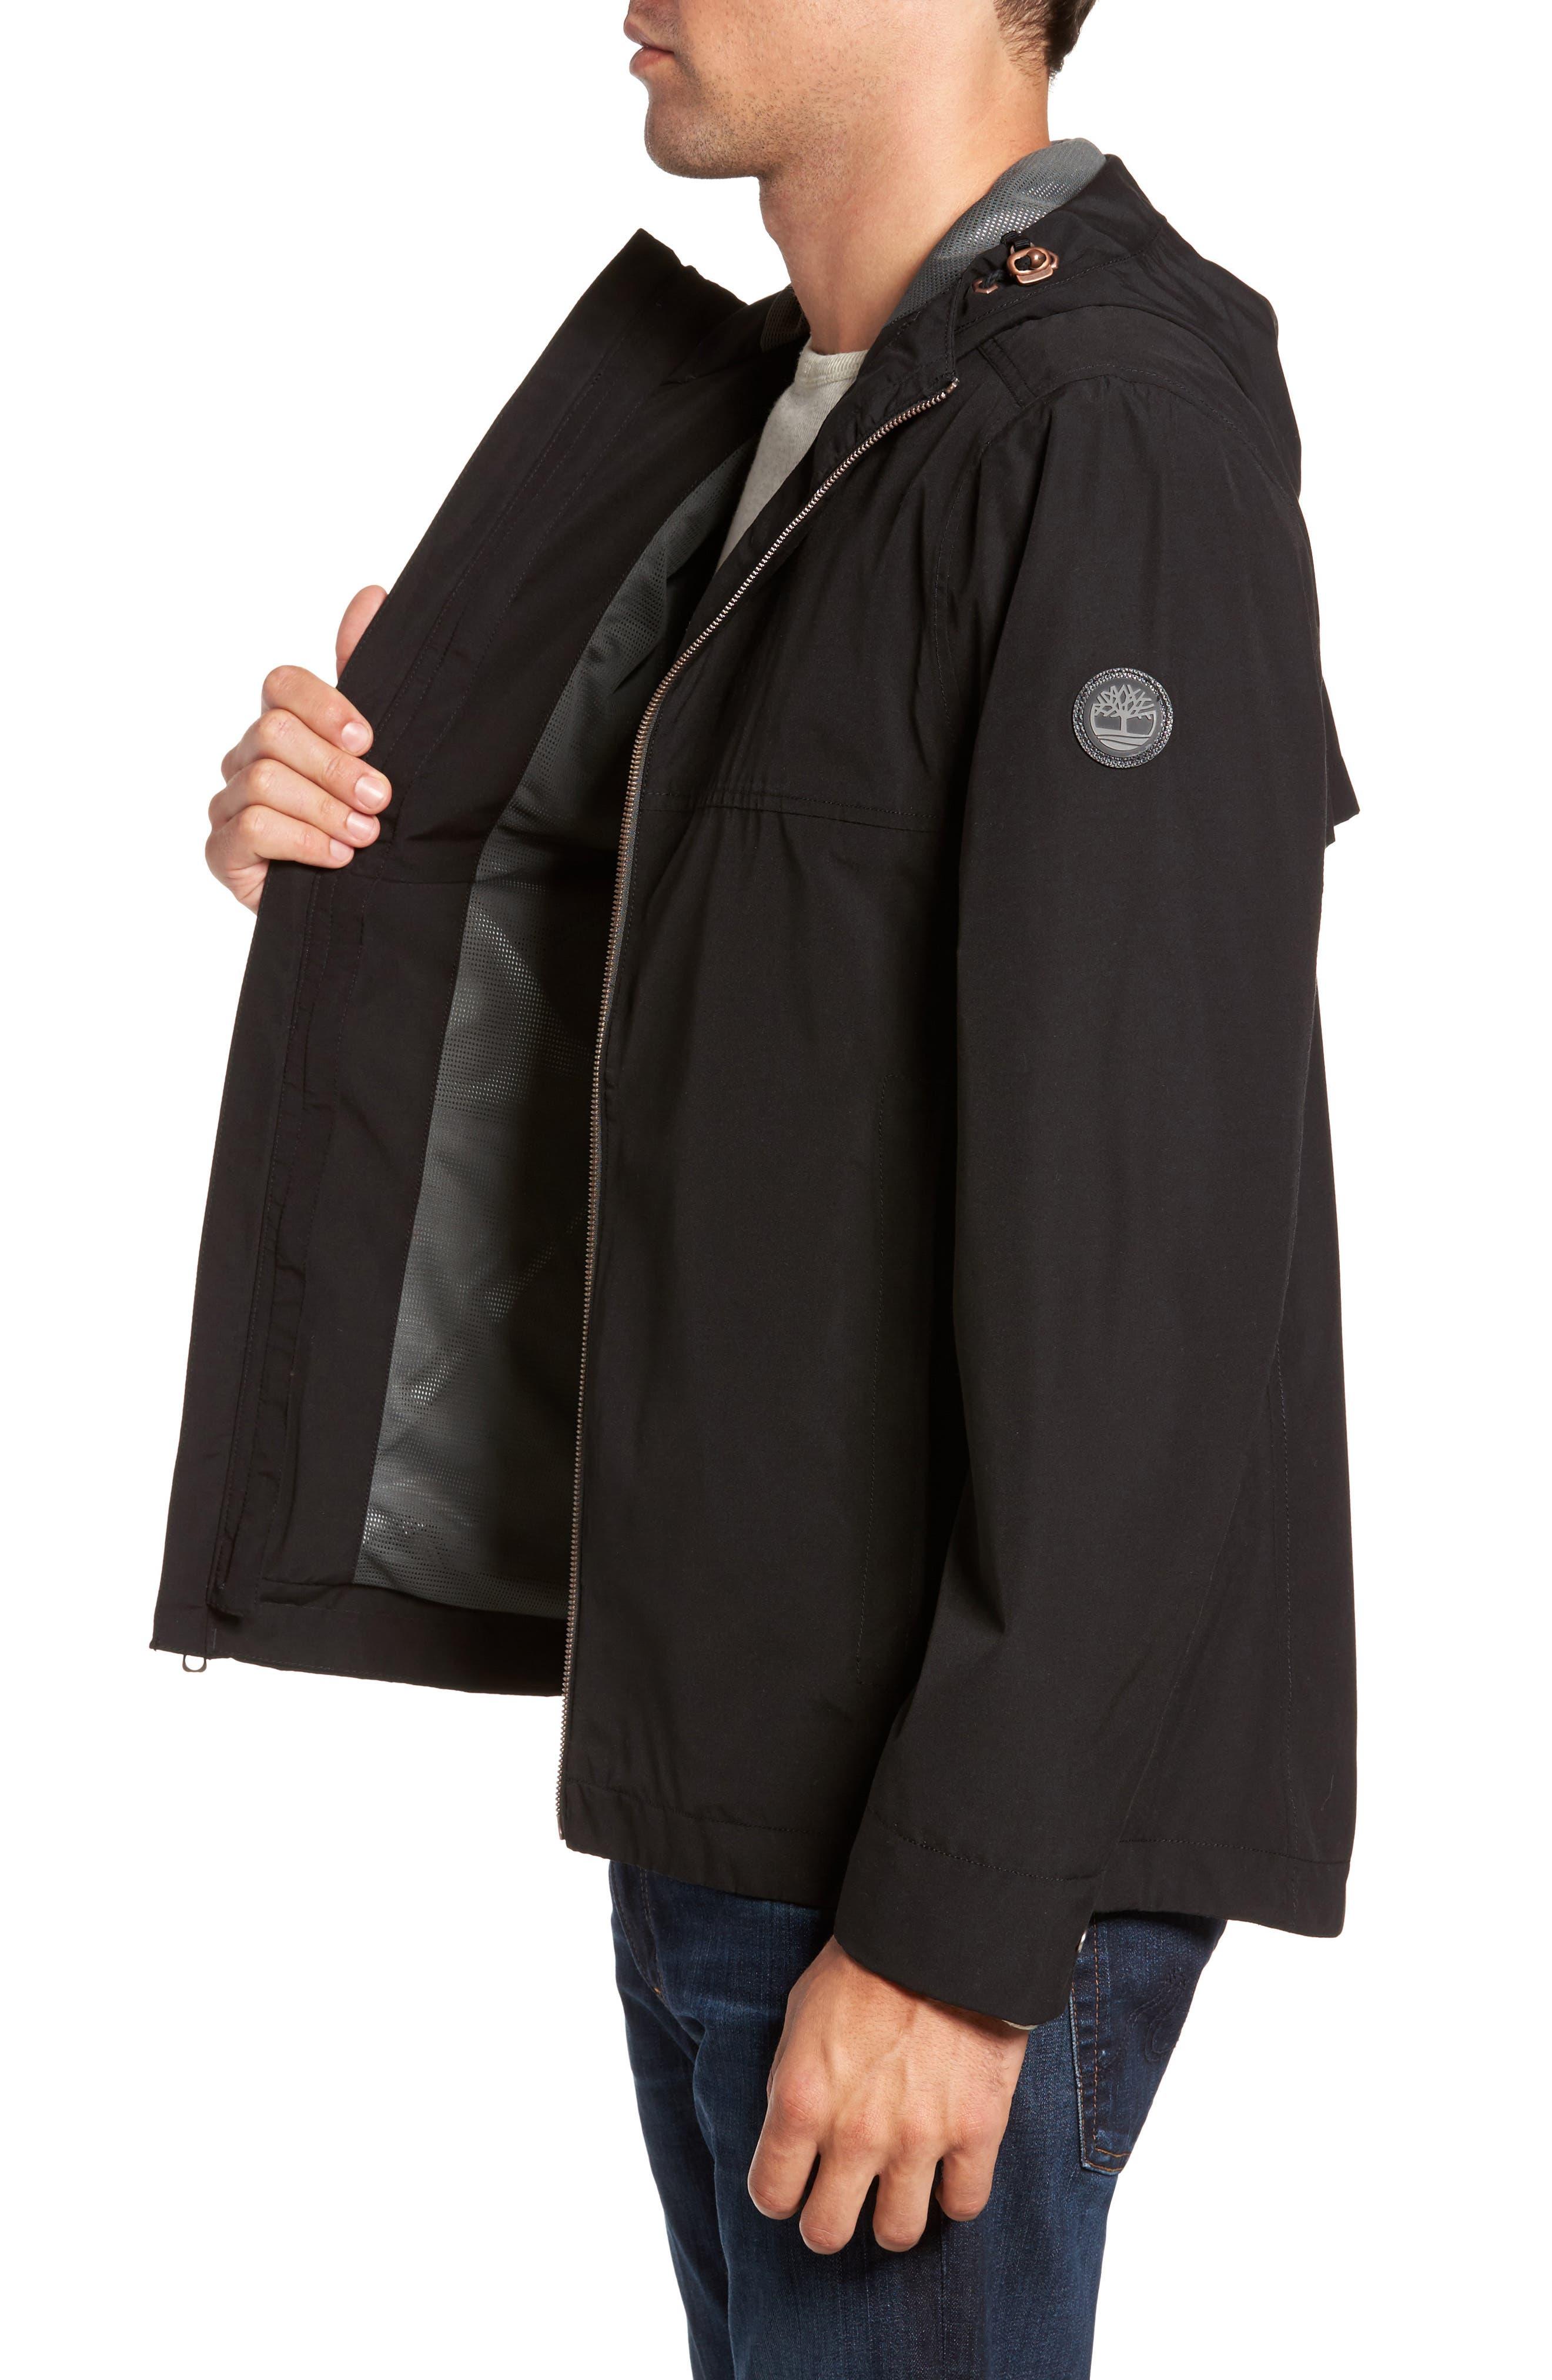 Ragged Mountain Packable Waterproof Jacket,                             Alternate thumbnail 3, color,                             001